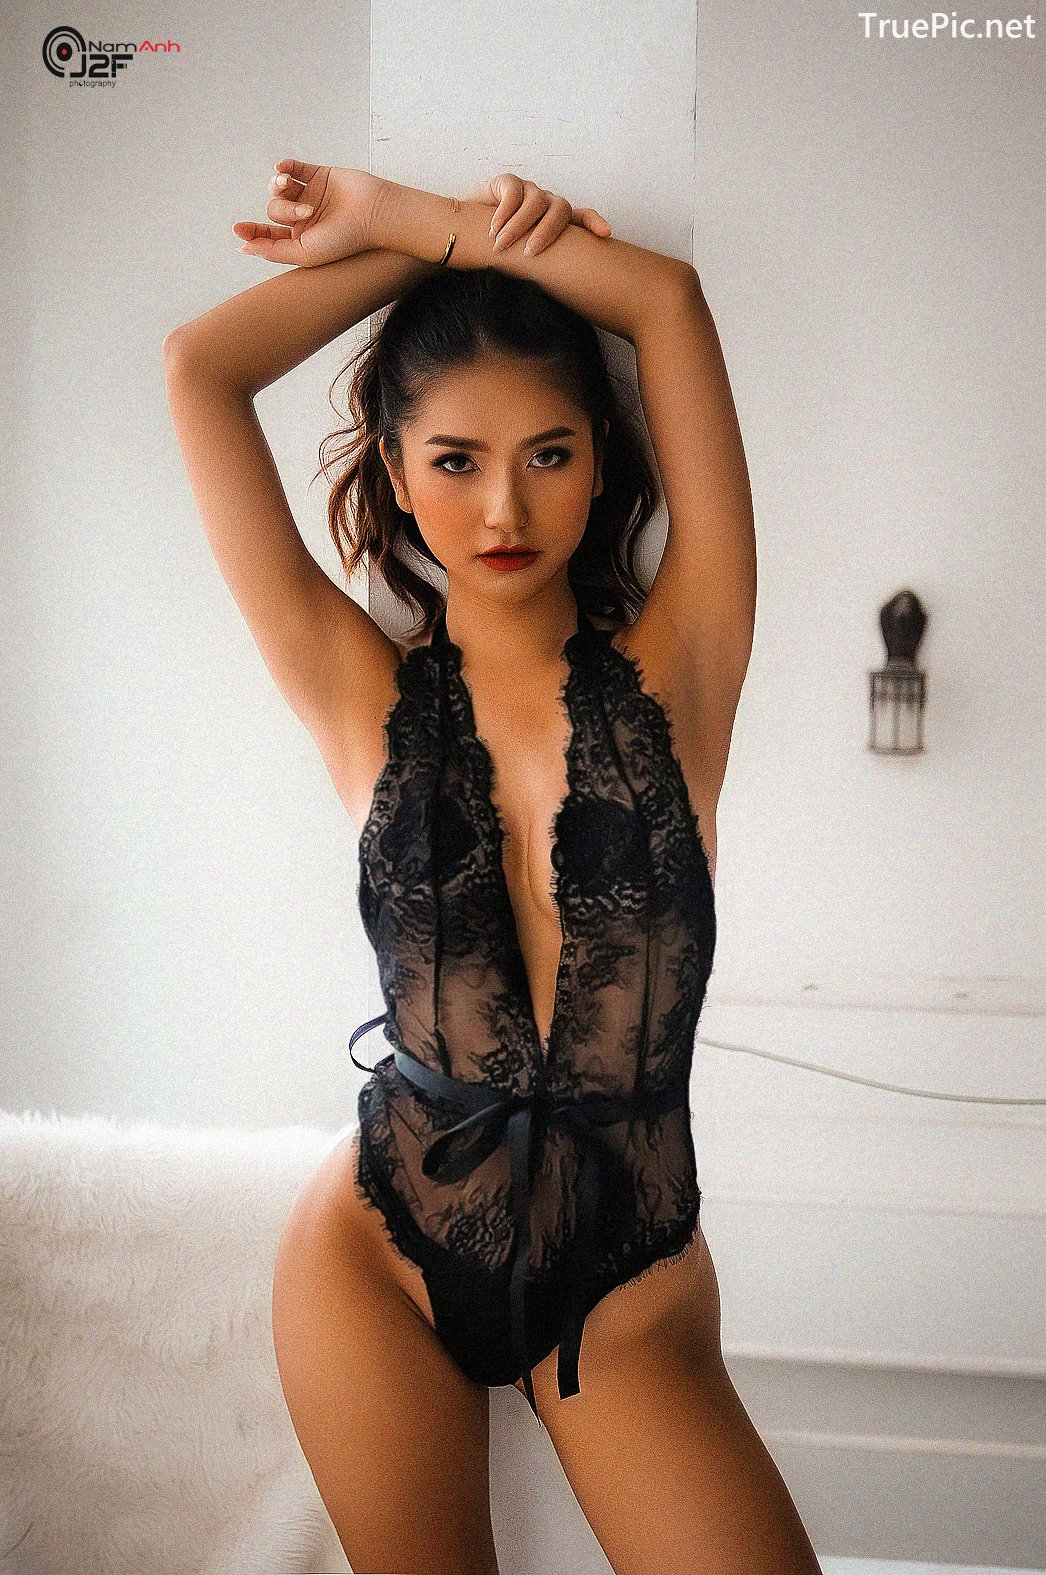 Image Vietnamese Model – Sexy Beauty of Beautiful Girls Taken by NamAnh Photo #7 - TruePic.net - Picture-31